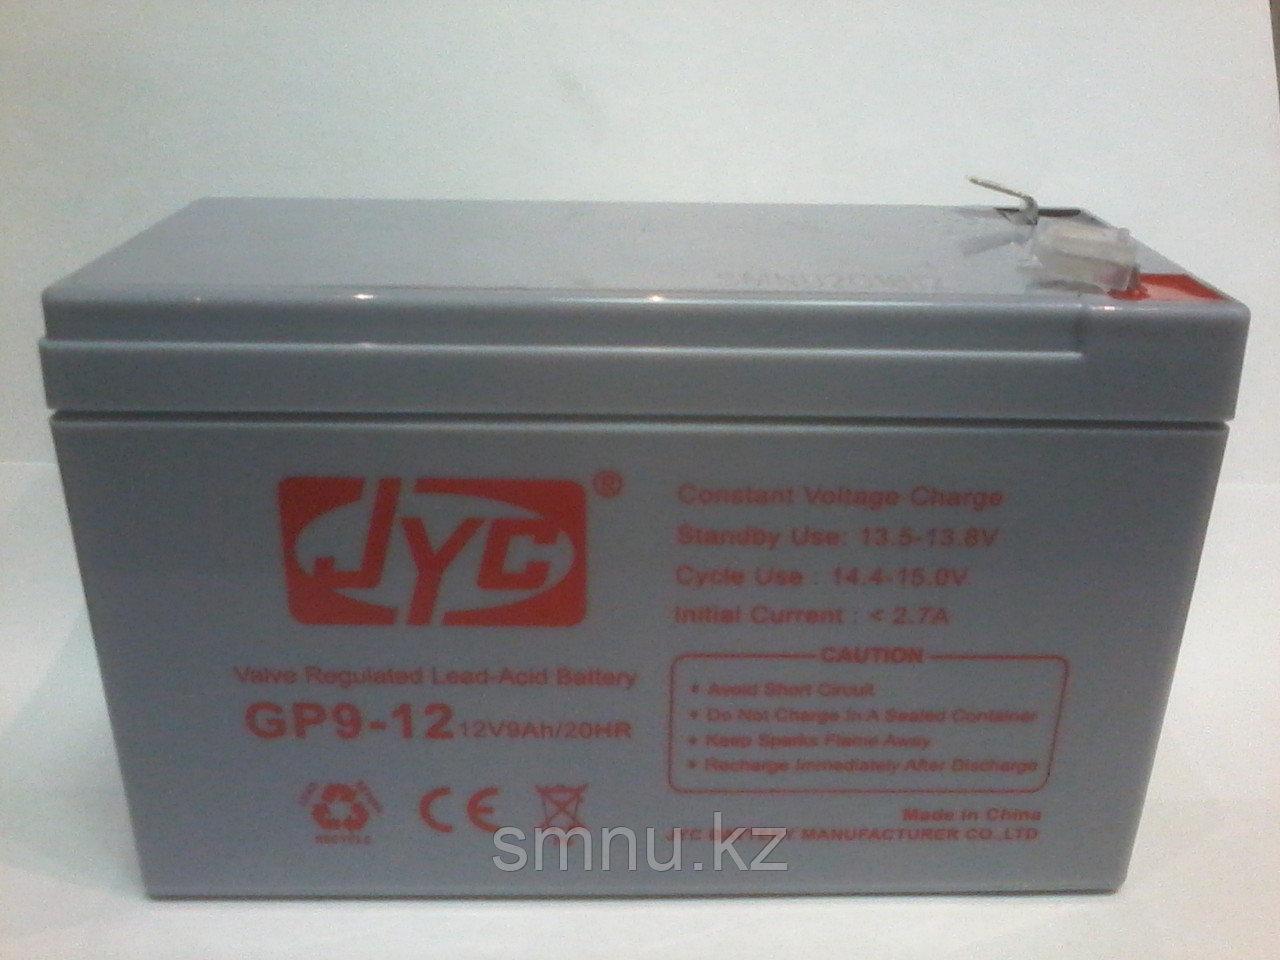 Аккумулятор   JYC  12В  9Ah